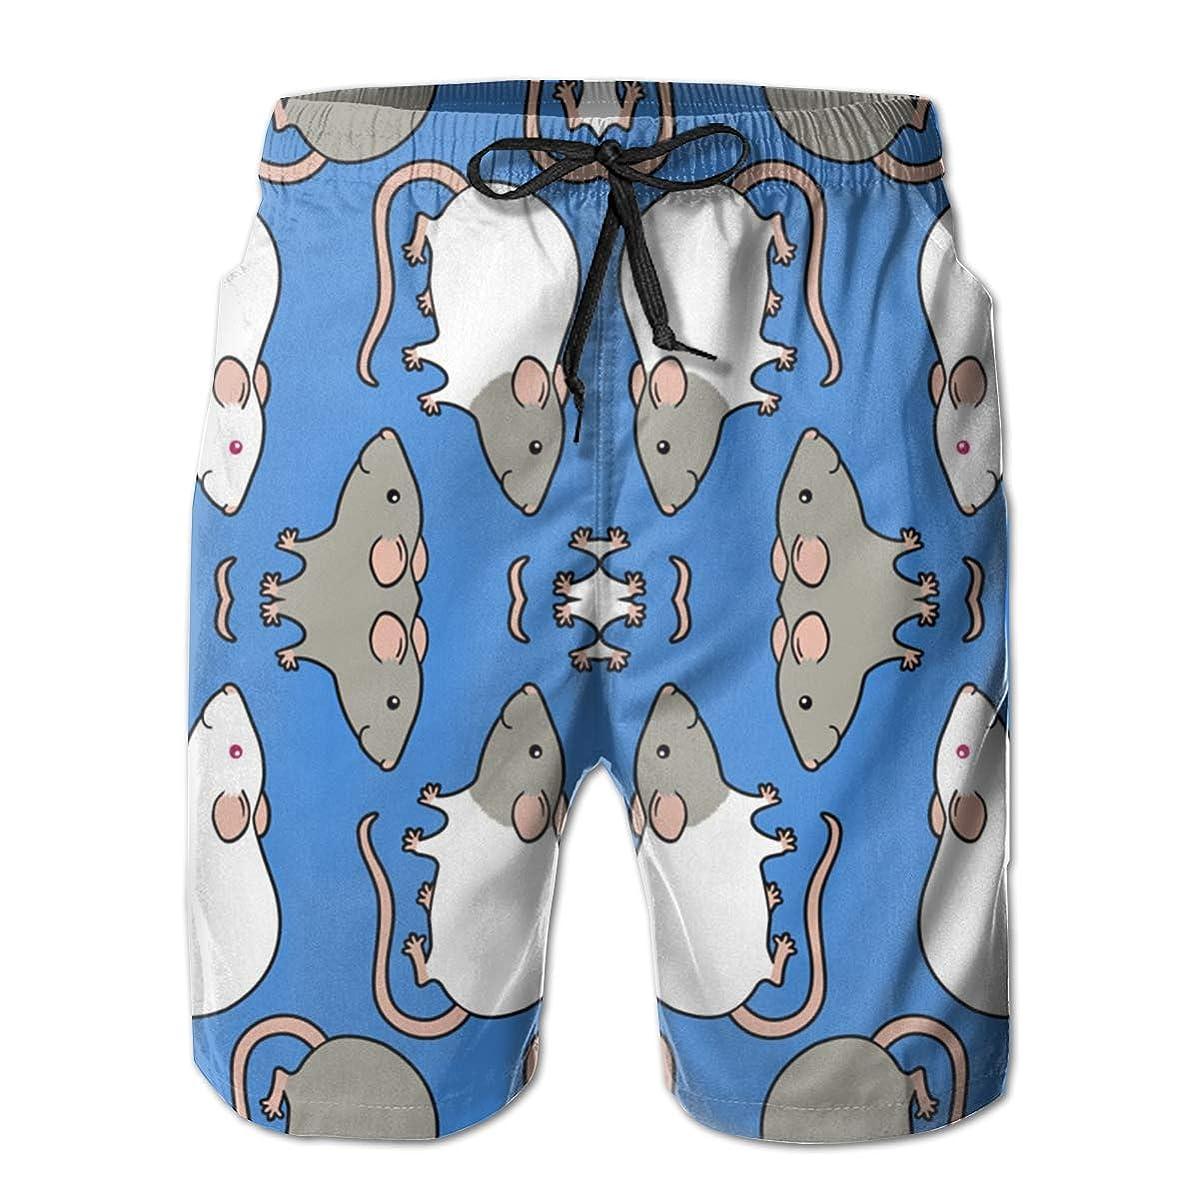 Jiqnajn6 Cute Rats Men's Swim Trunks Quick Dry Summer Surf Beach Board Shorts with Mesh Lining/Side Pockets